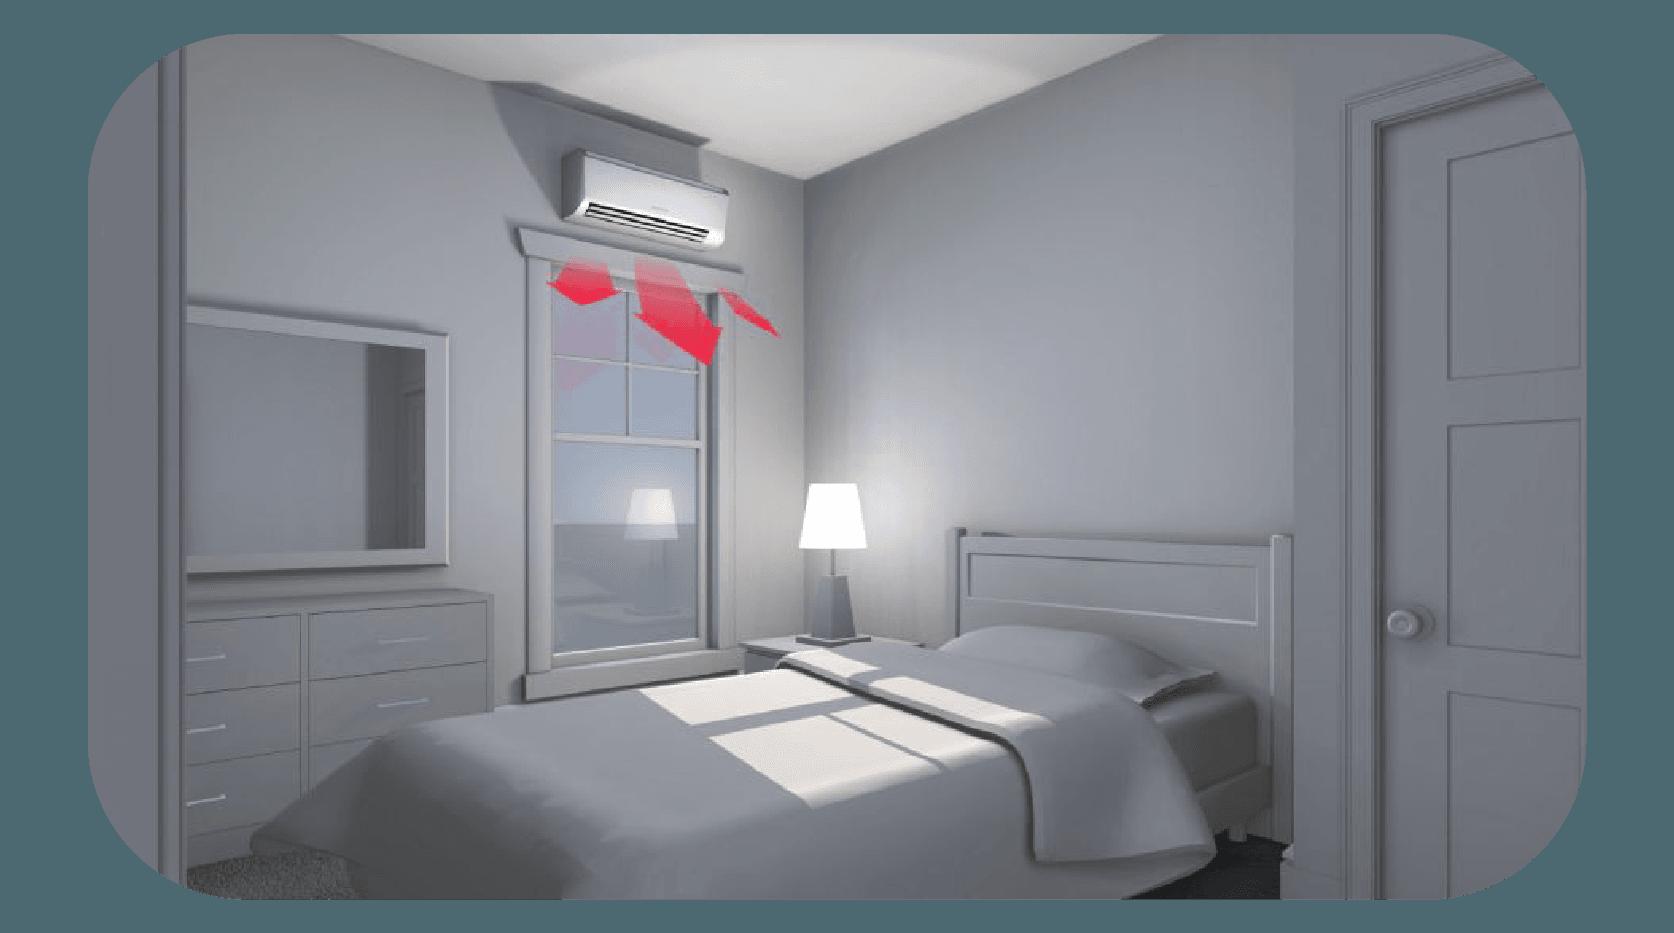 Mitsubishi Electric heating